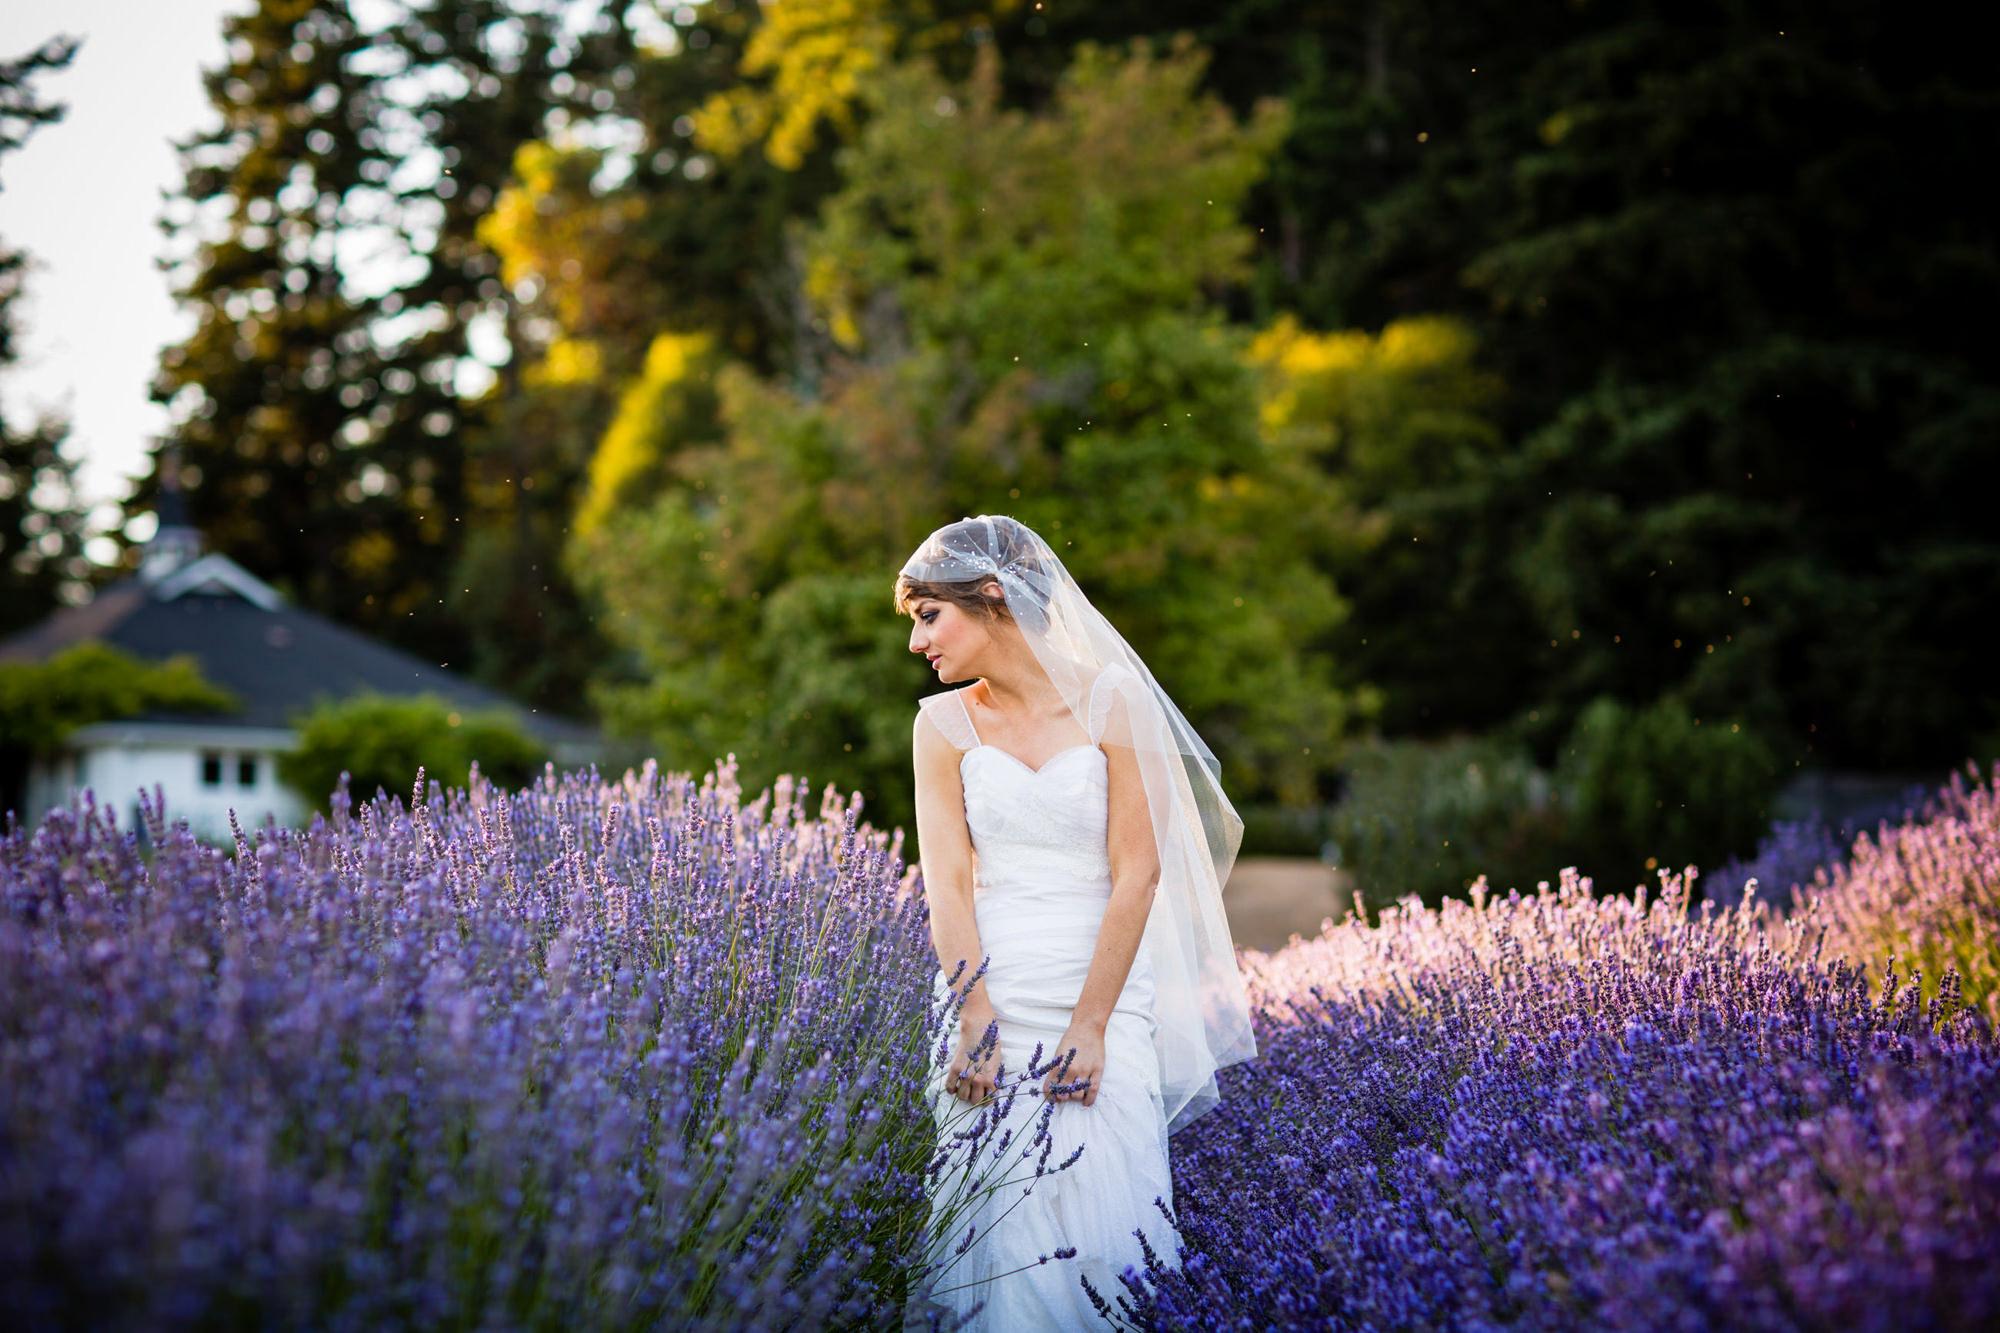 bride-in-lavender-field-with-veil-worlds-best-wedding-photos-san-juan-island-photographers-la-vie-photo